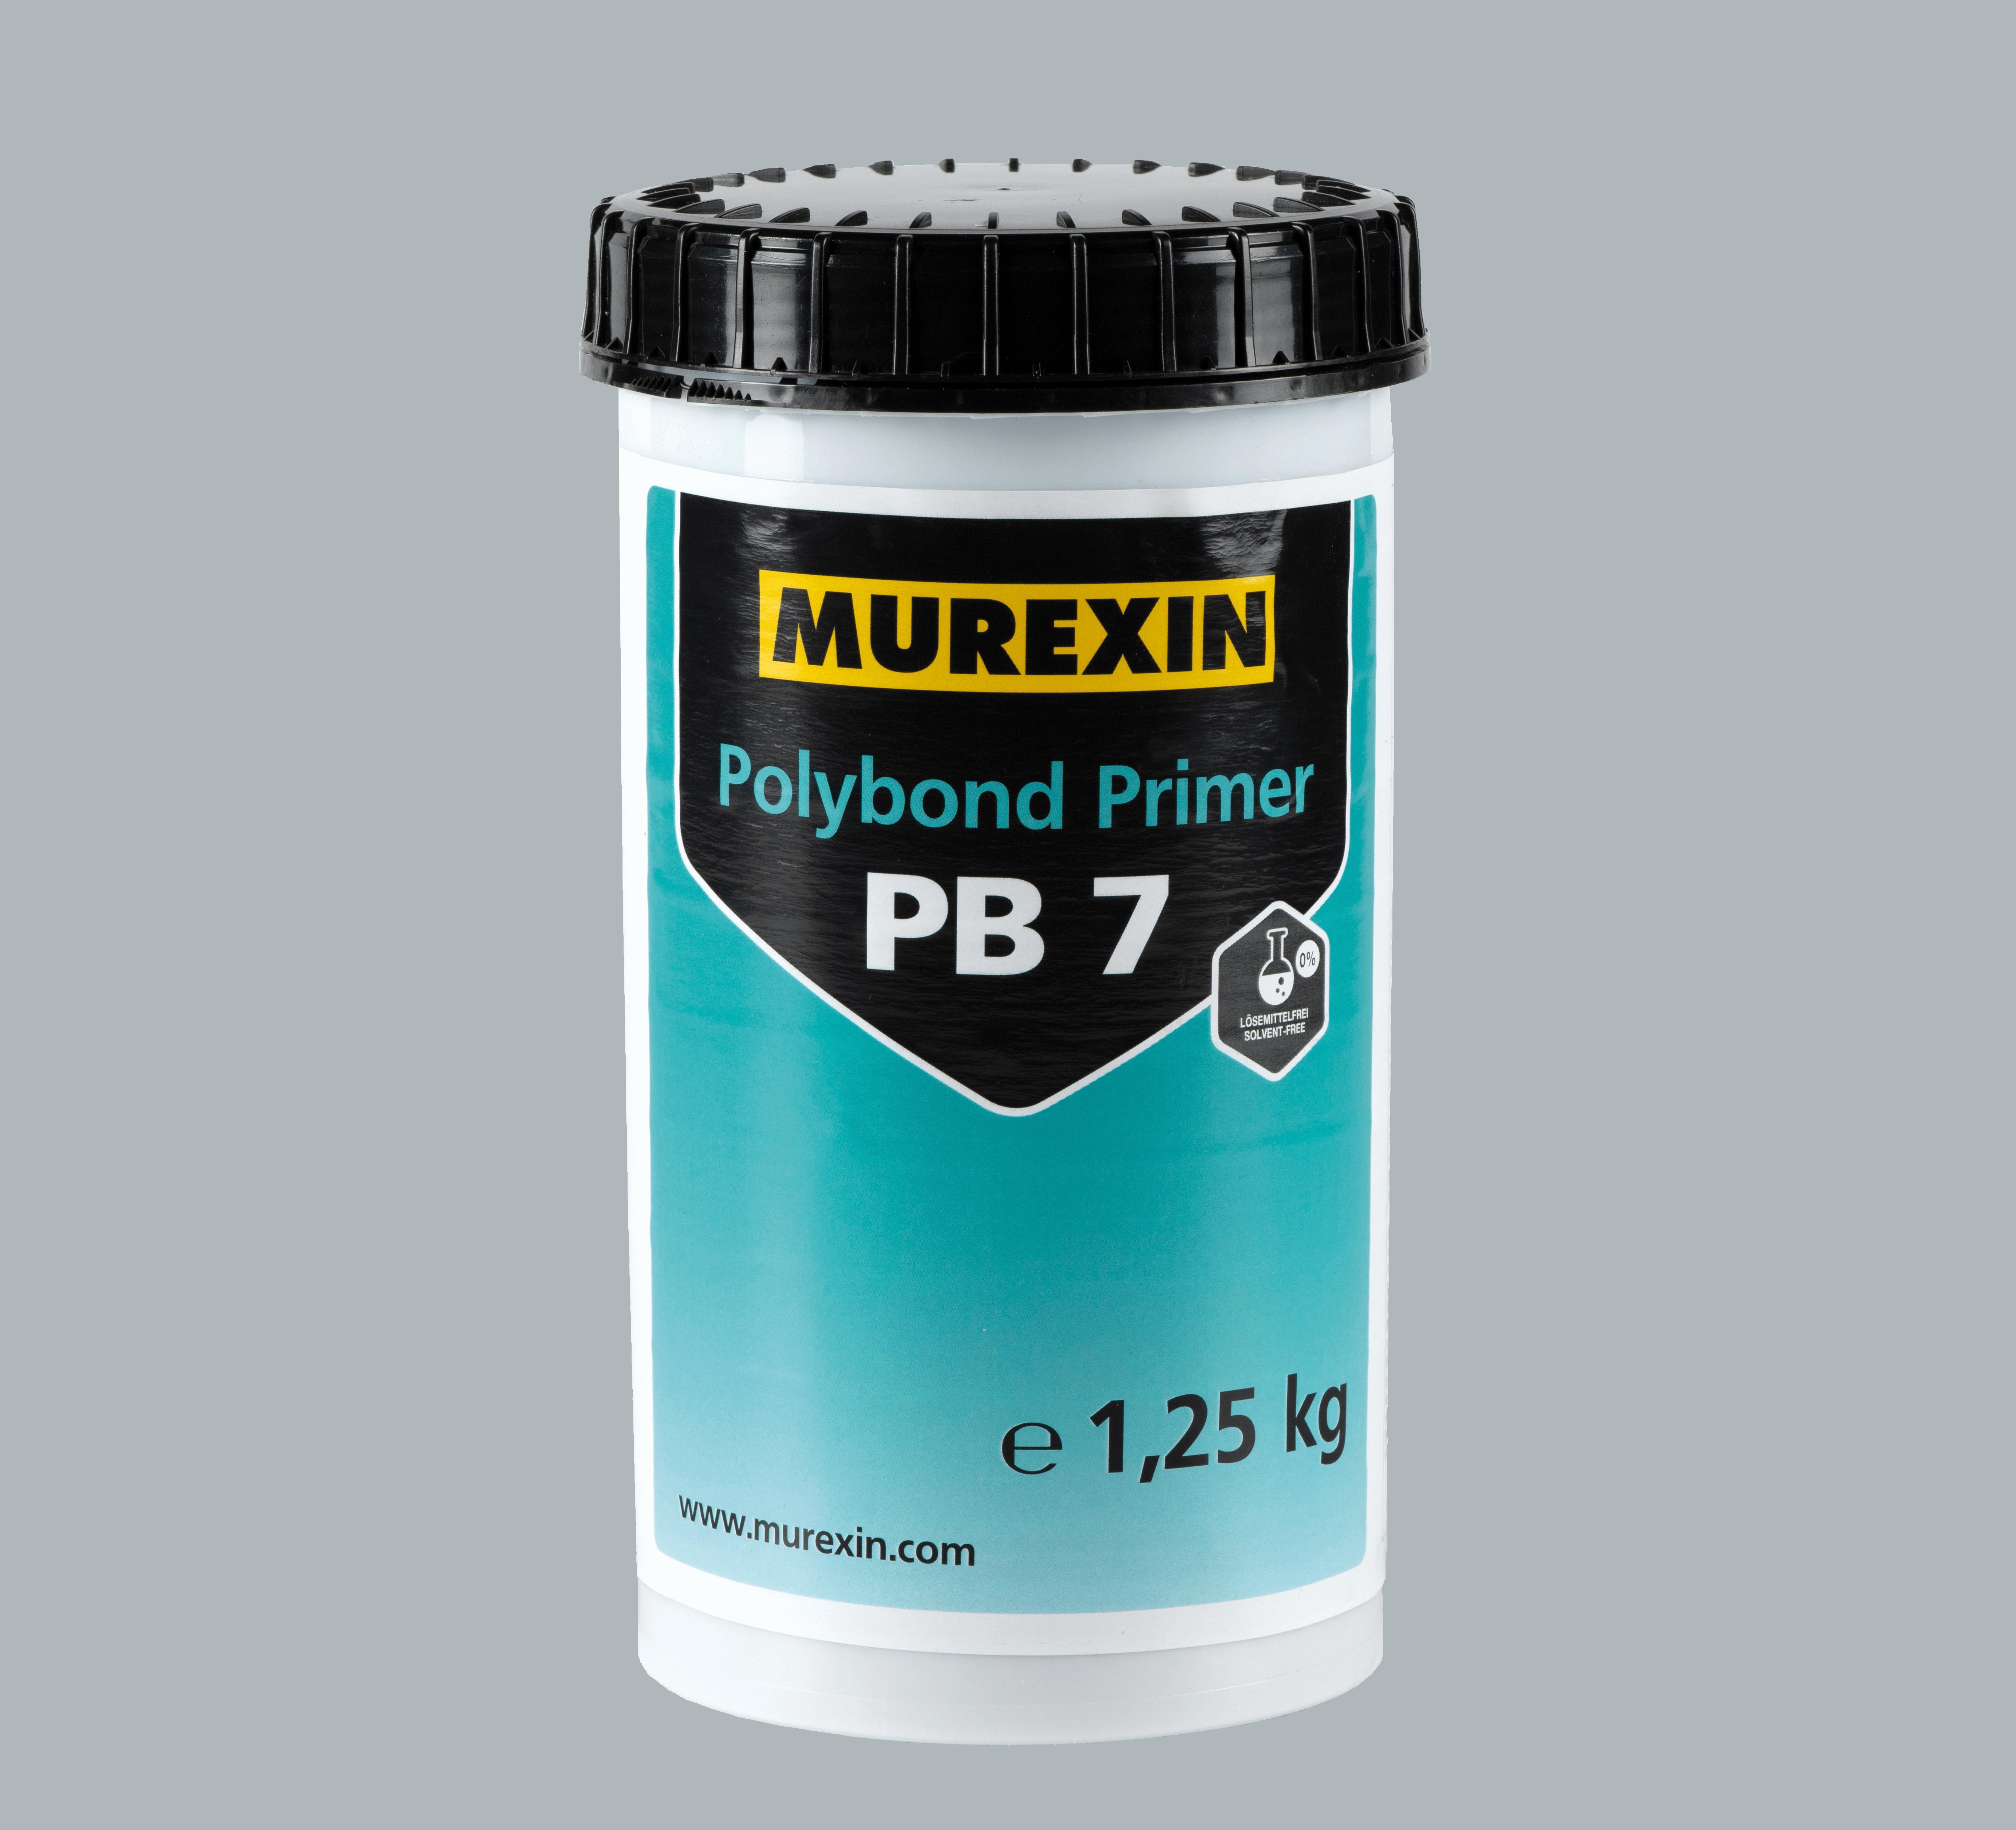 Murexin Polybond Primer PB 7 1.25 kg